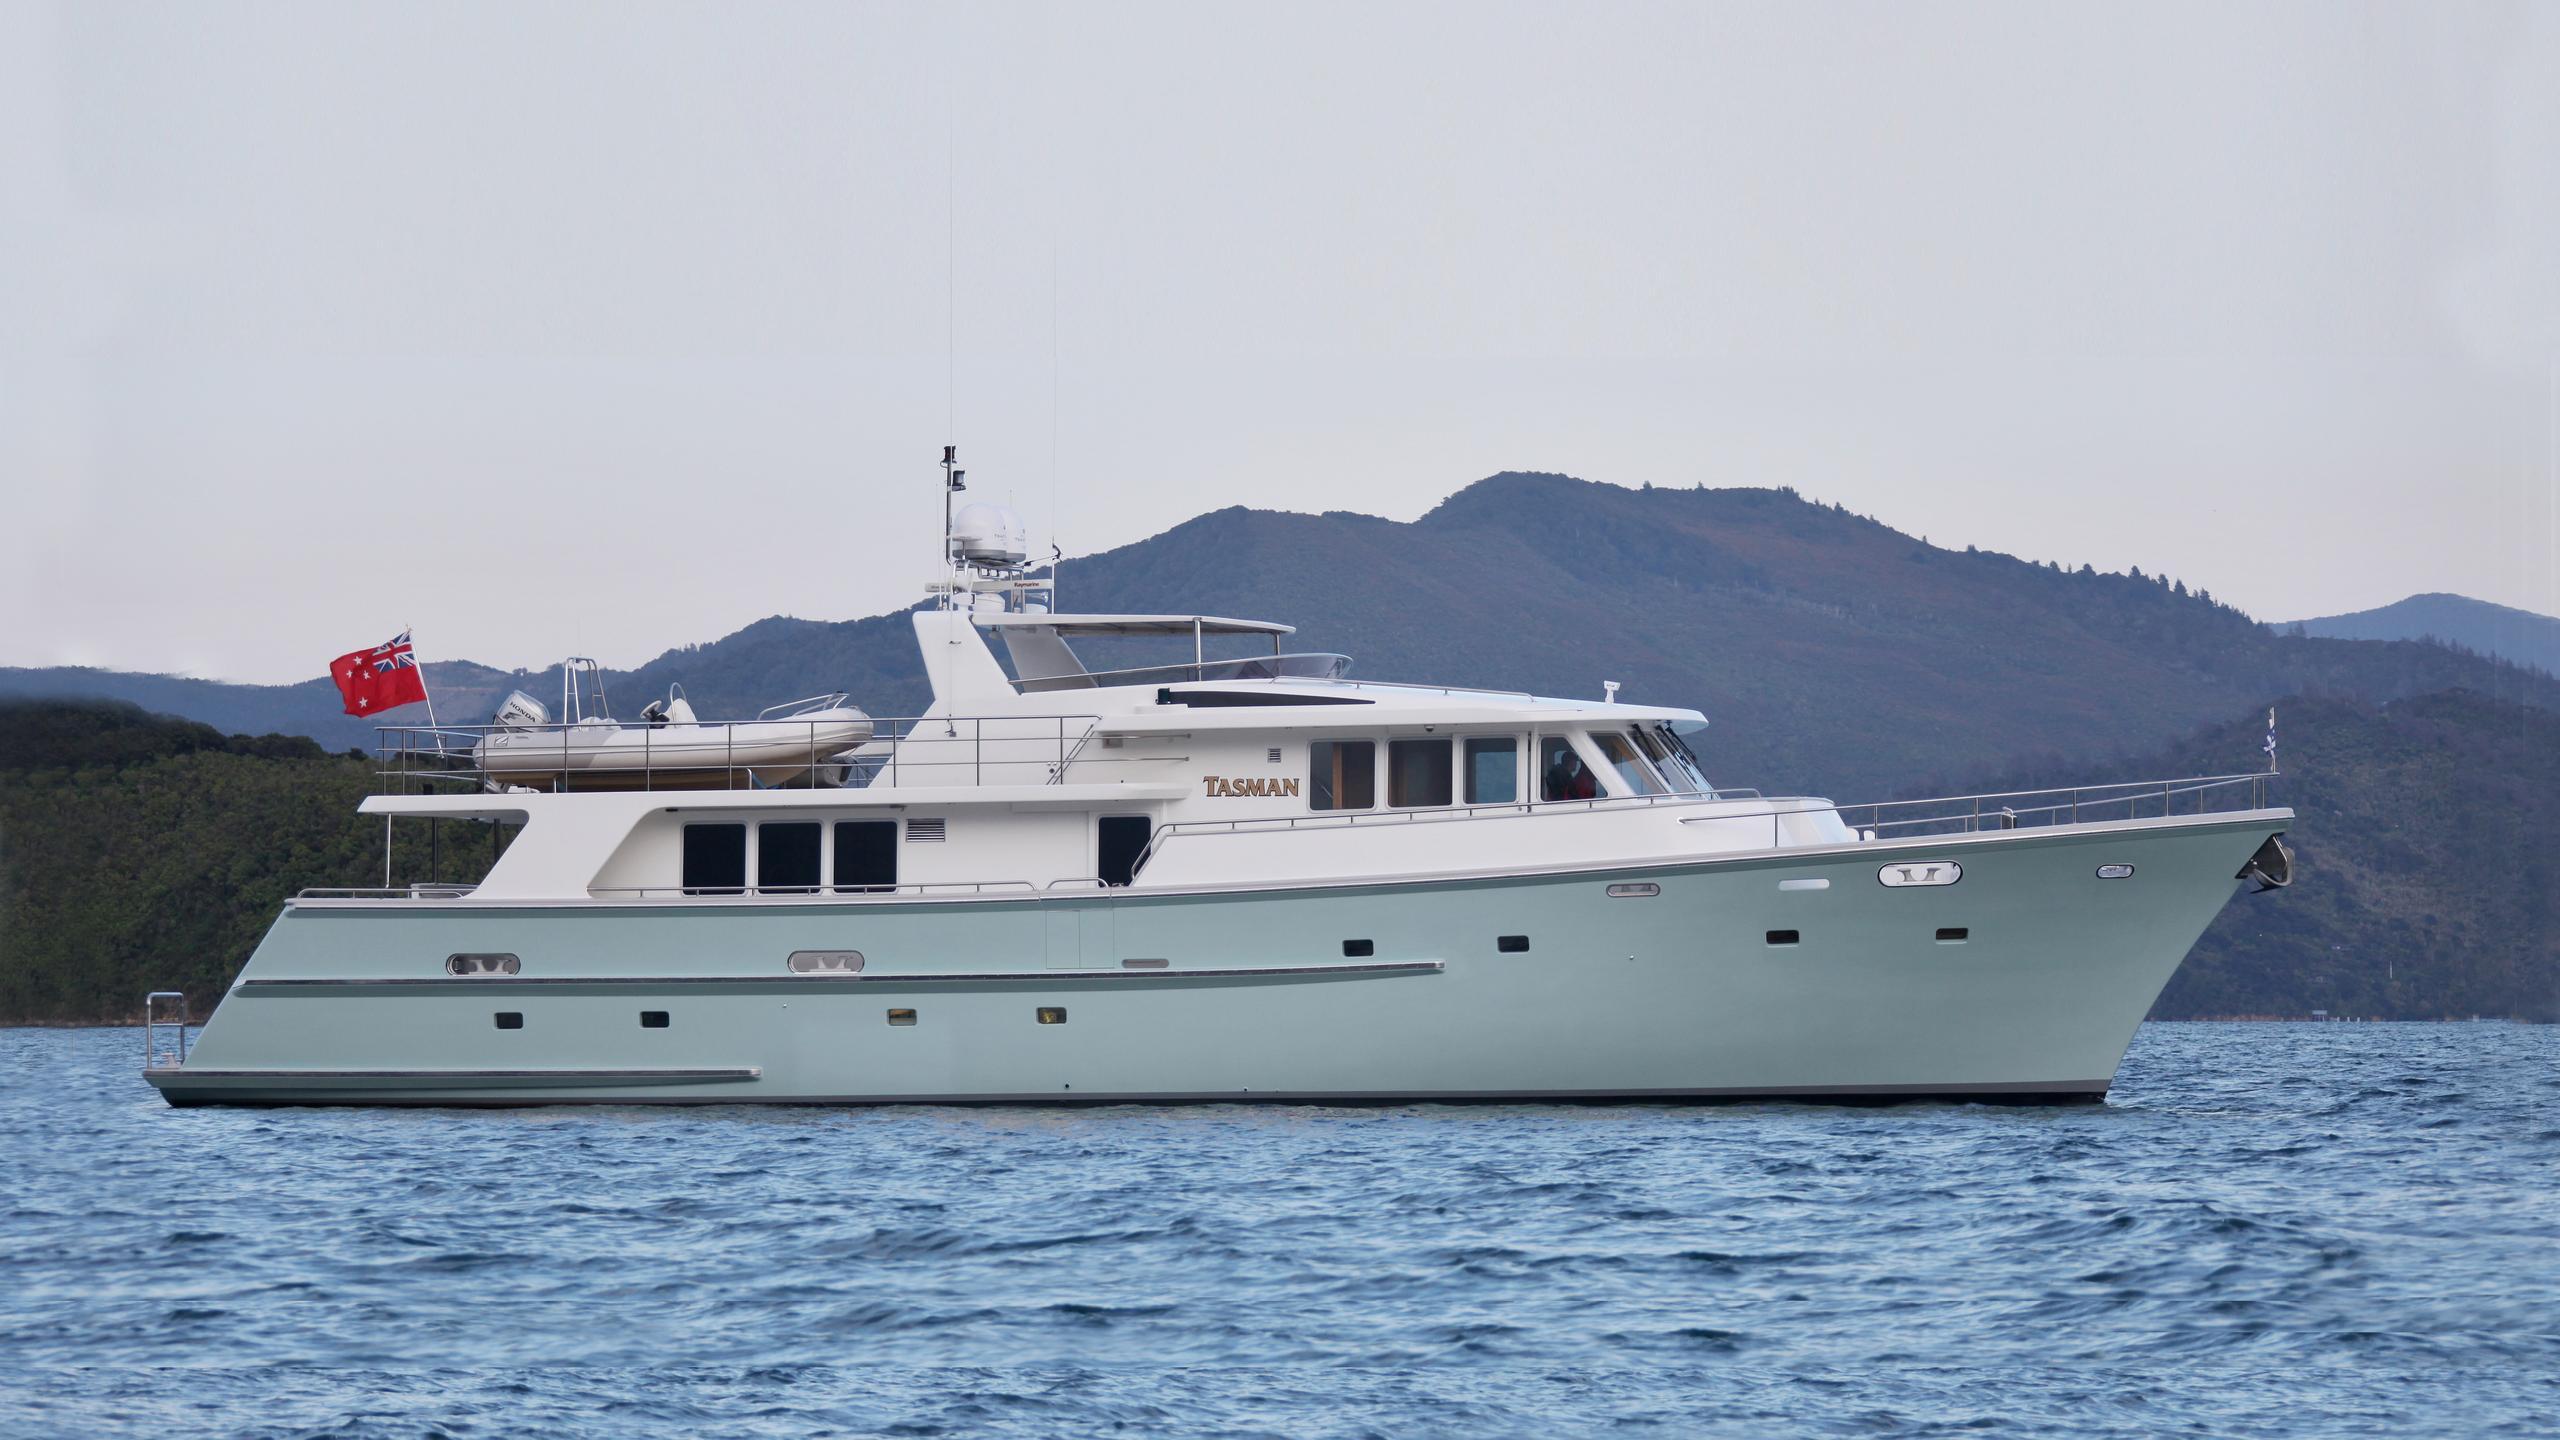 tasman-yacht-profile